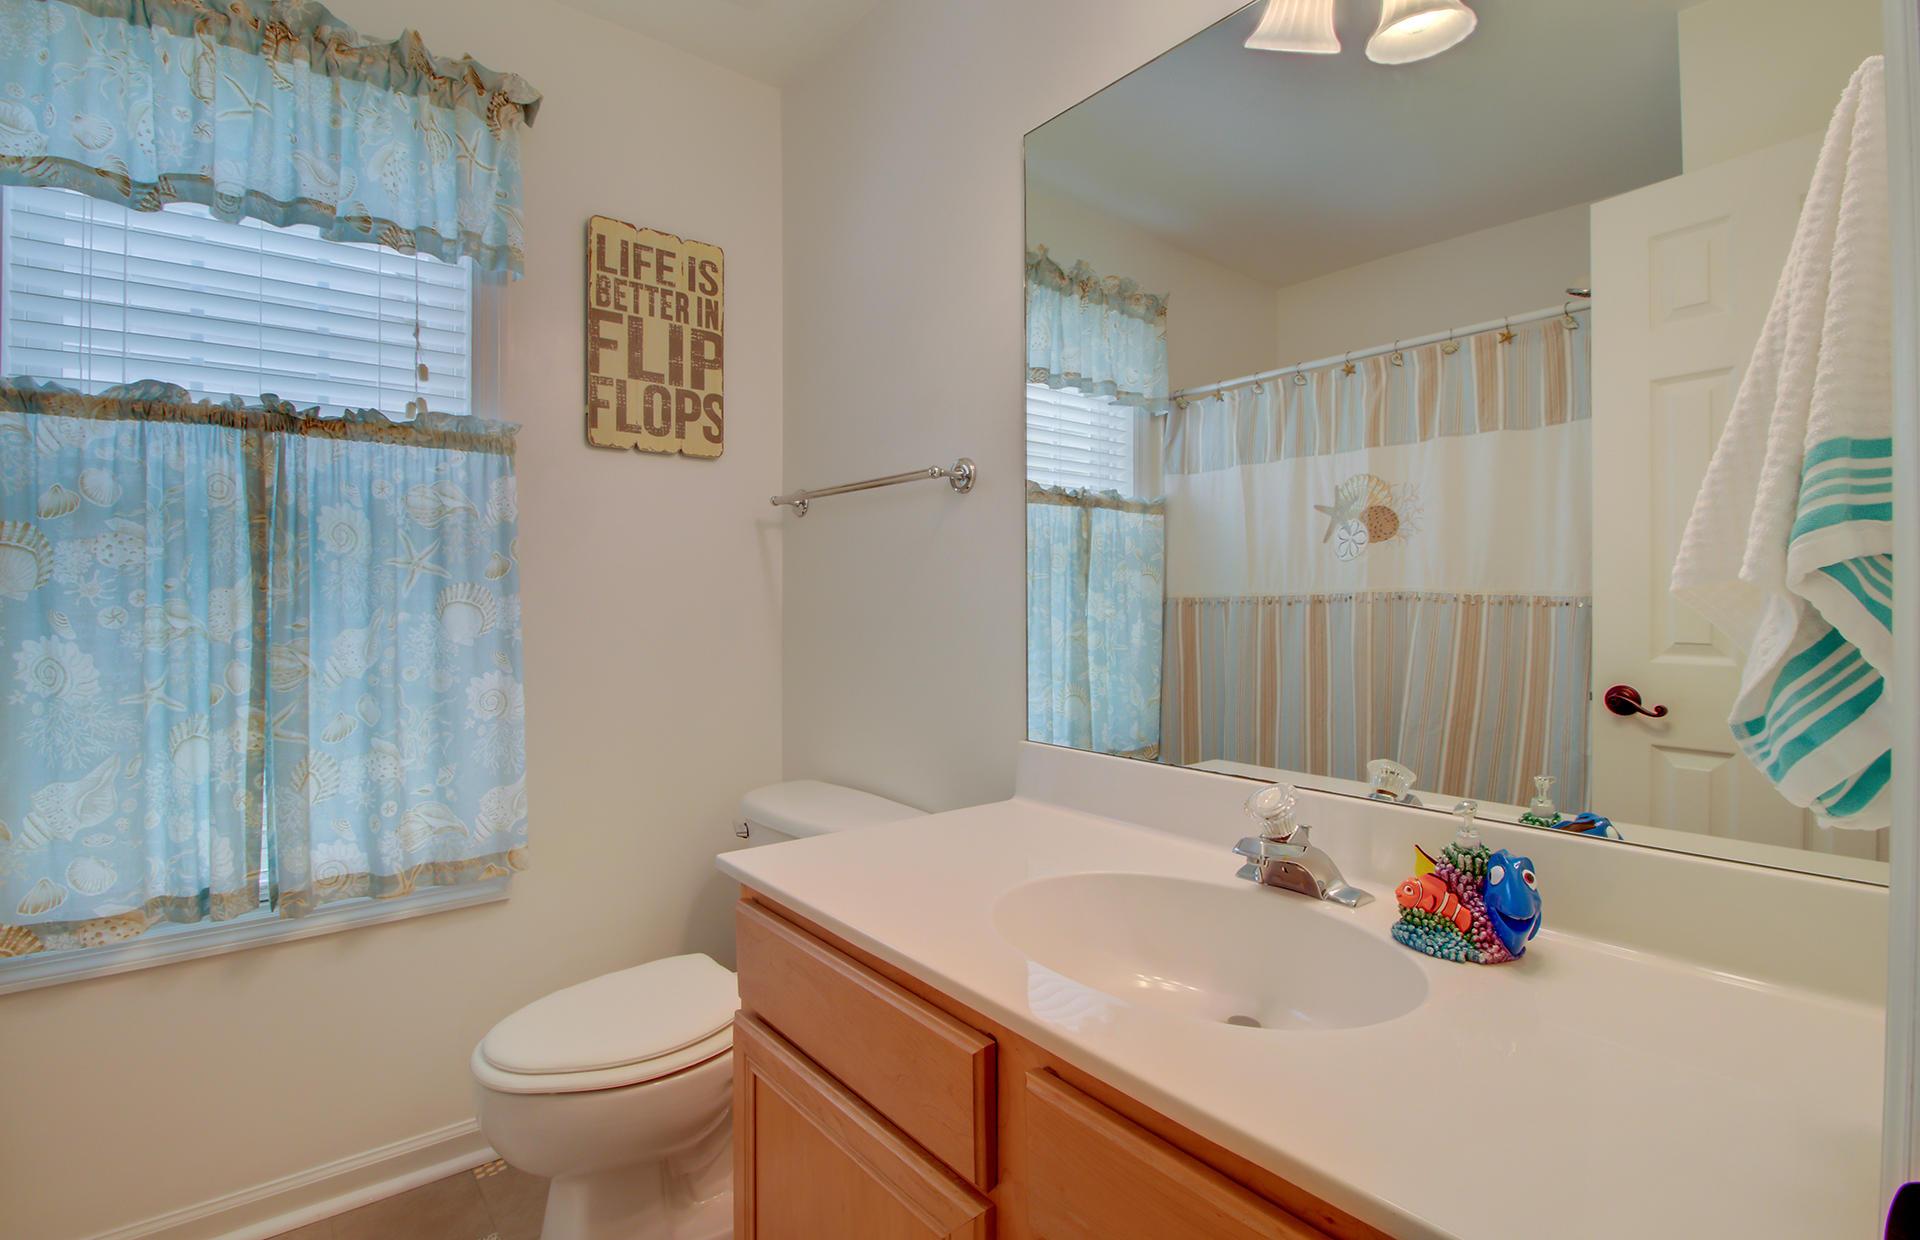 Park West Homes For Sale - 1500 Wellesley, Mount Pleasant, SC - 15